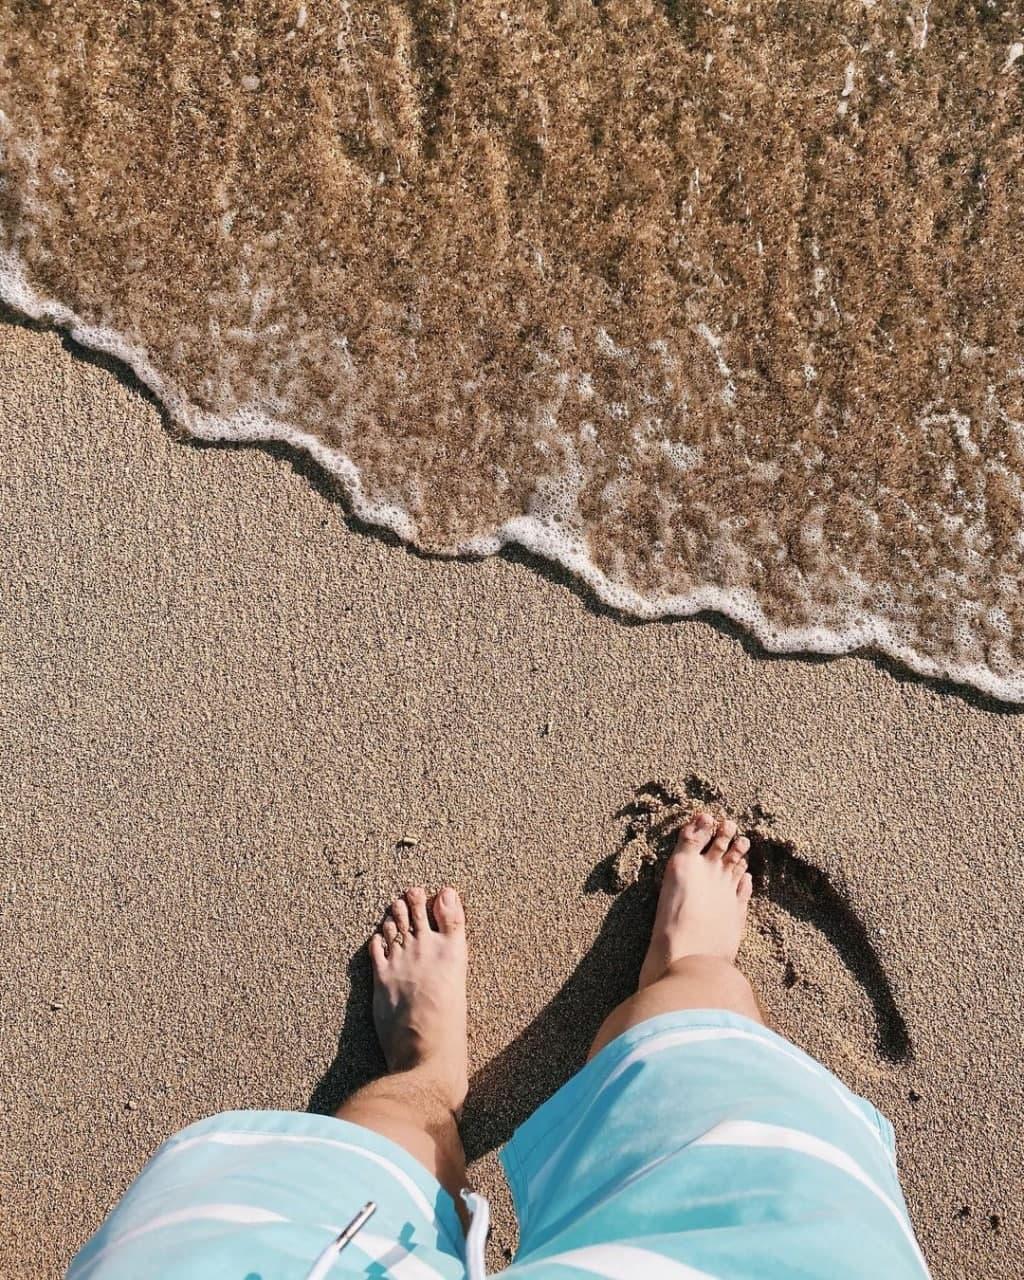 Soft ocean waves featuring a man's feet.